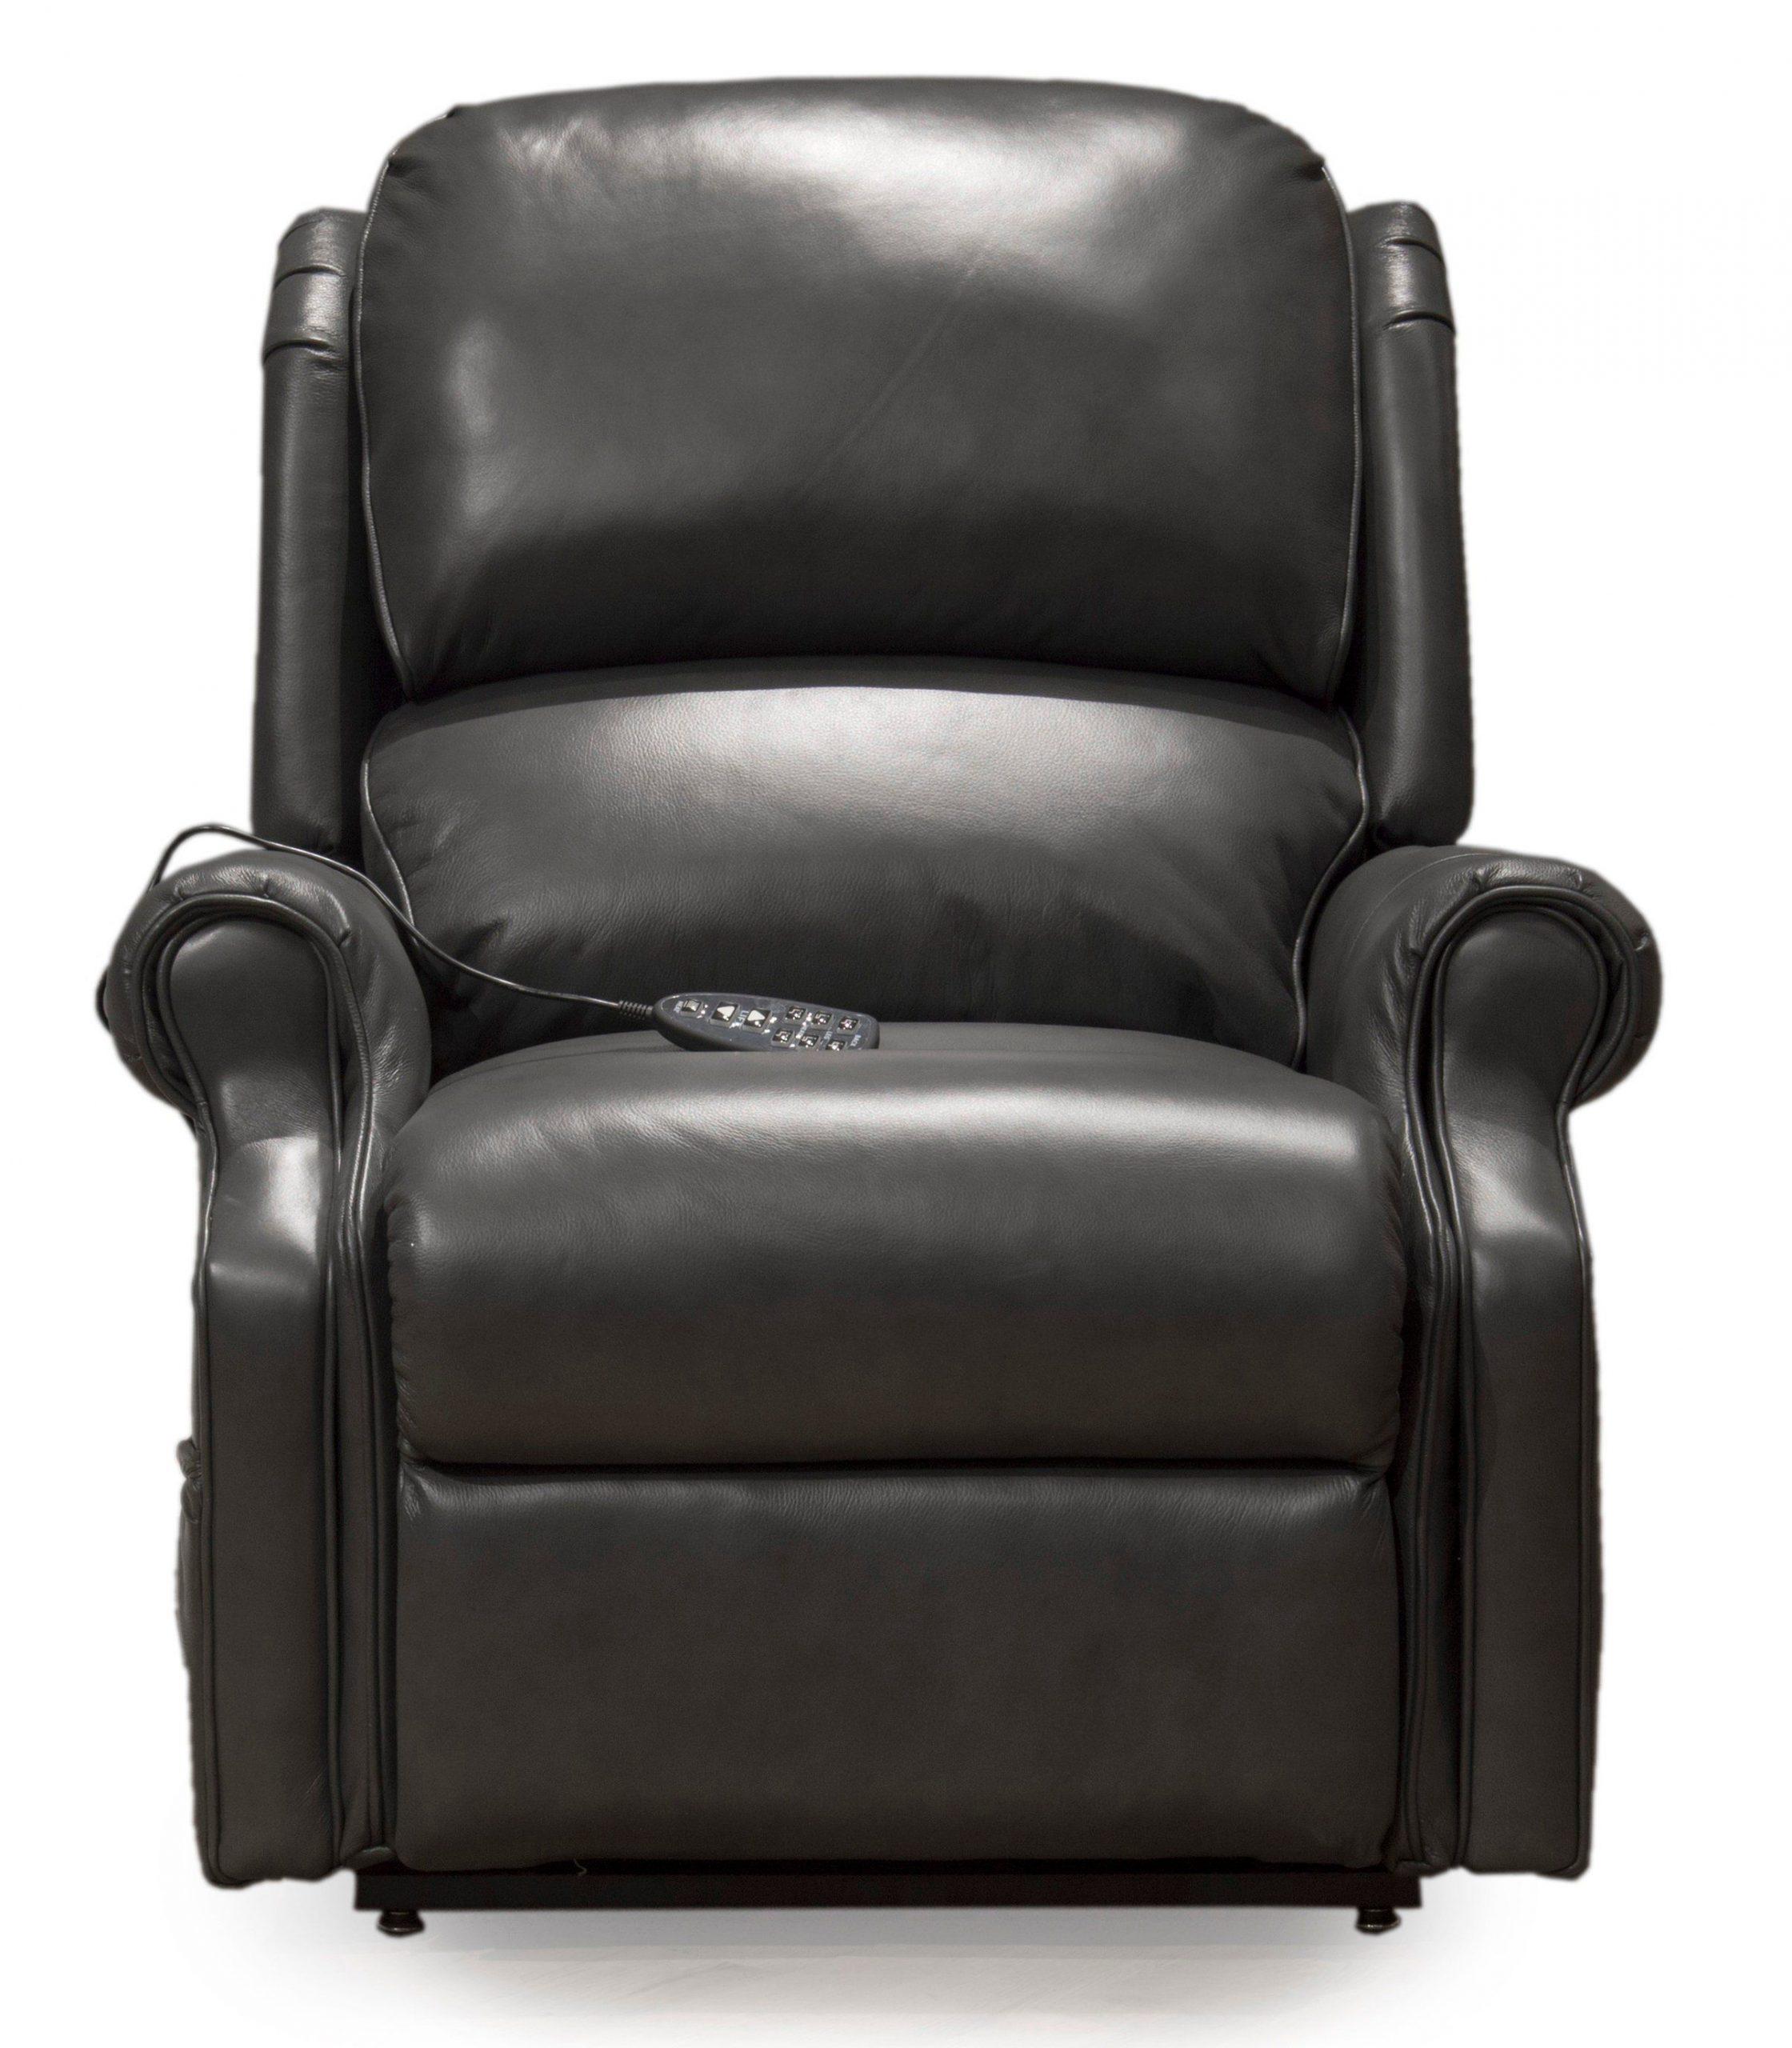 Smoke Gray Leather-Match Power Reclining Lift Chair – Palermo